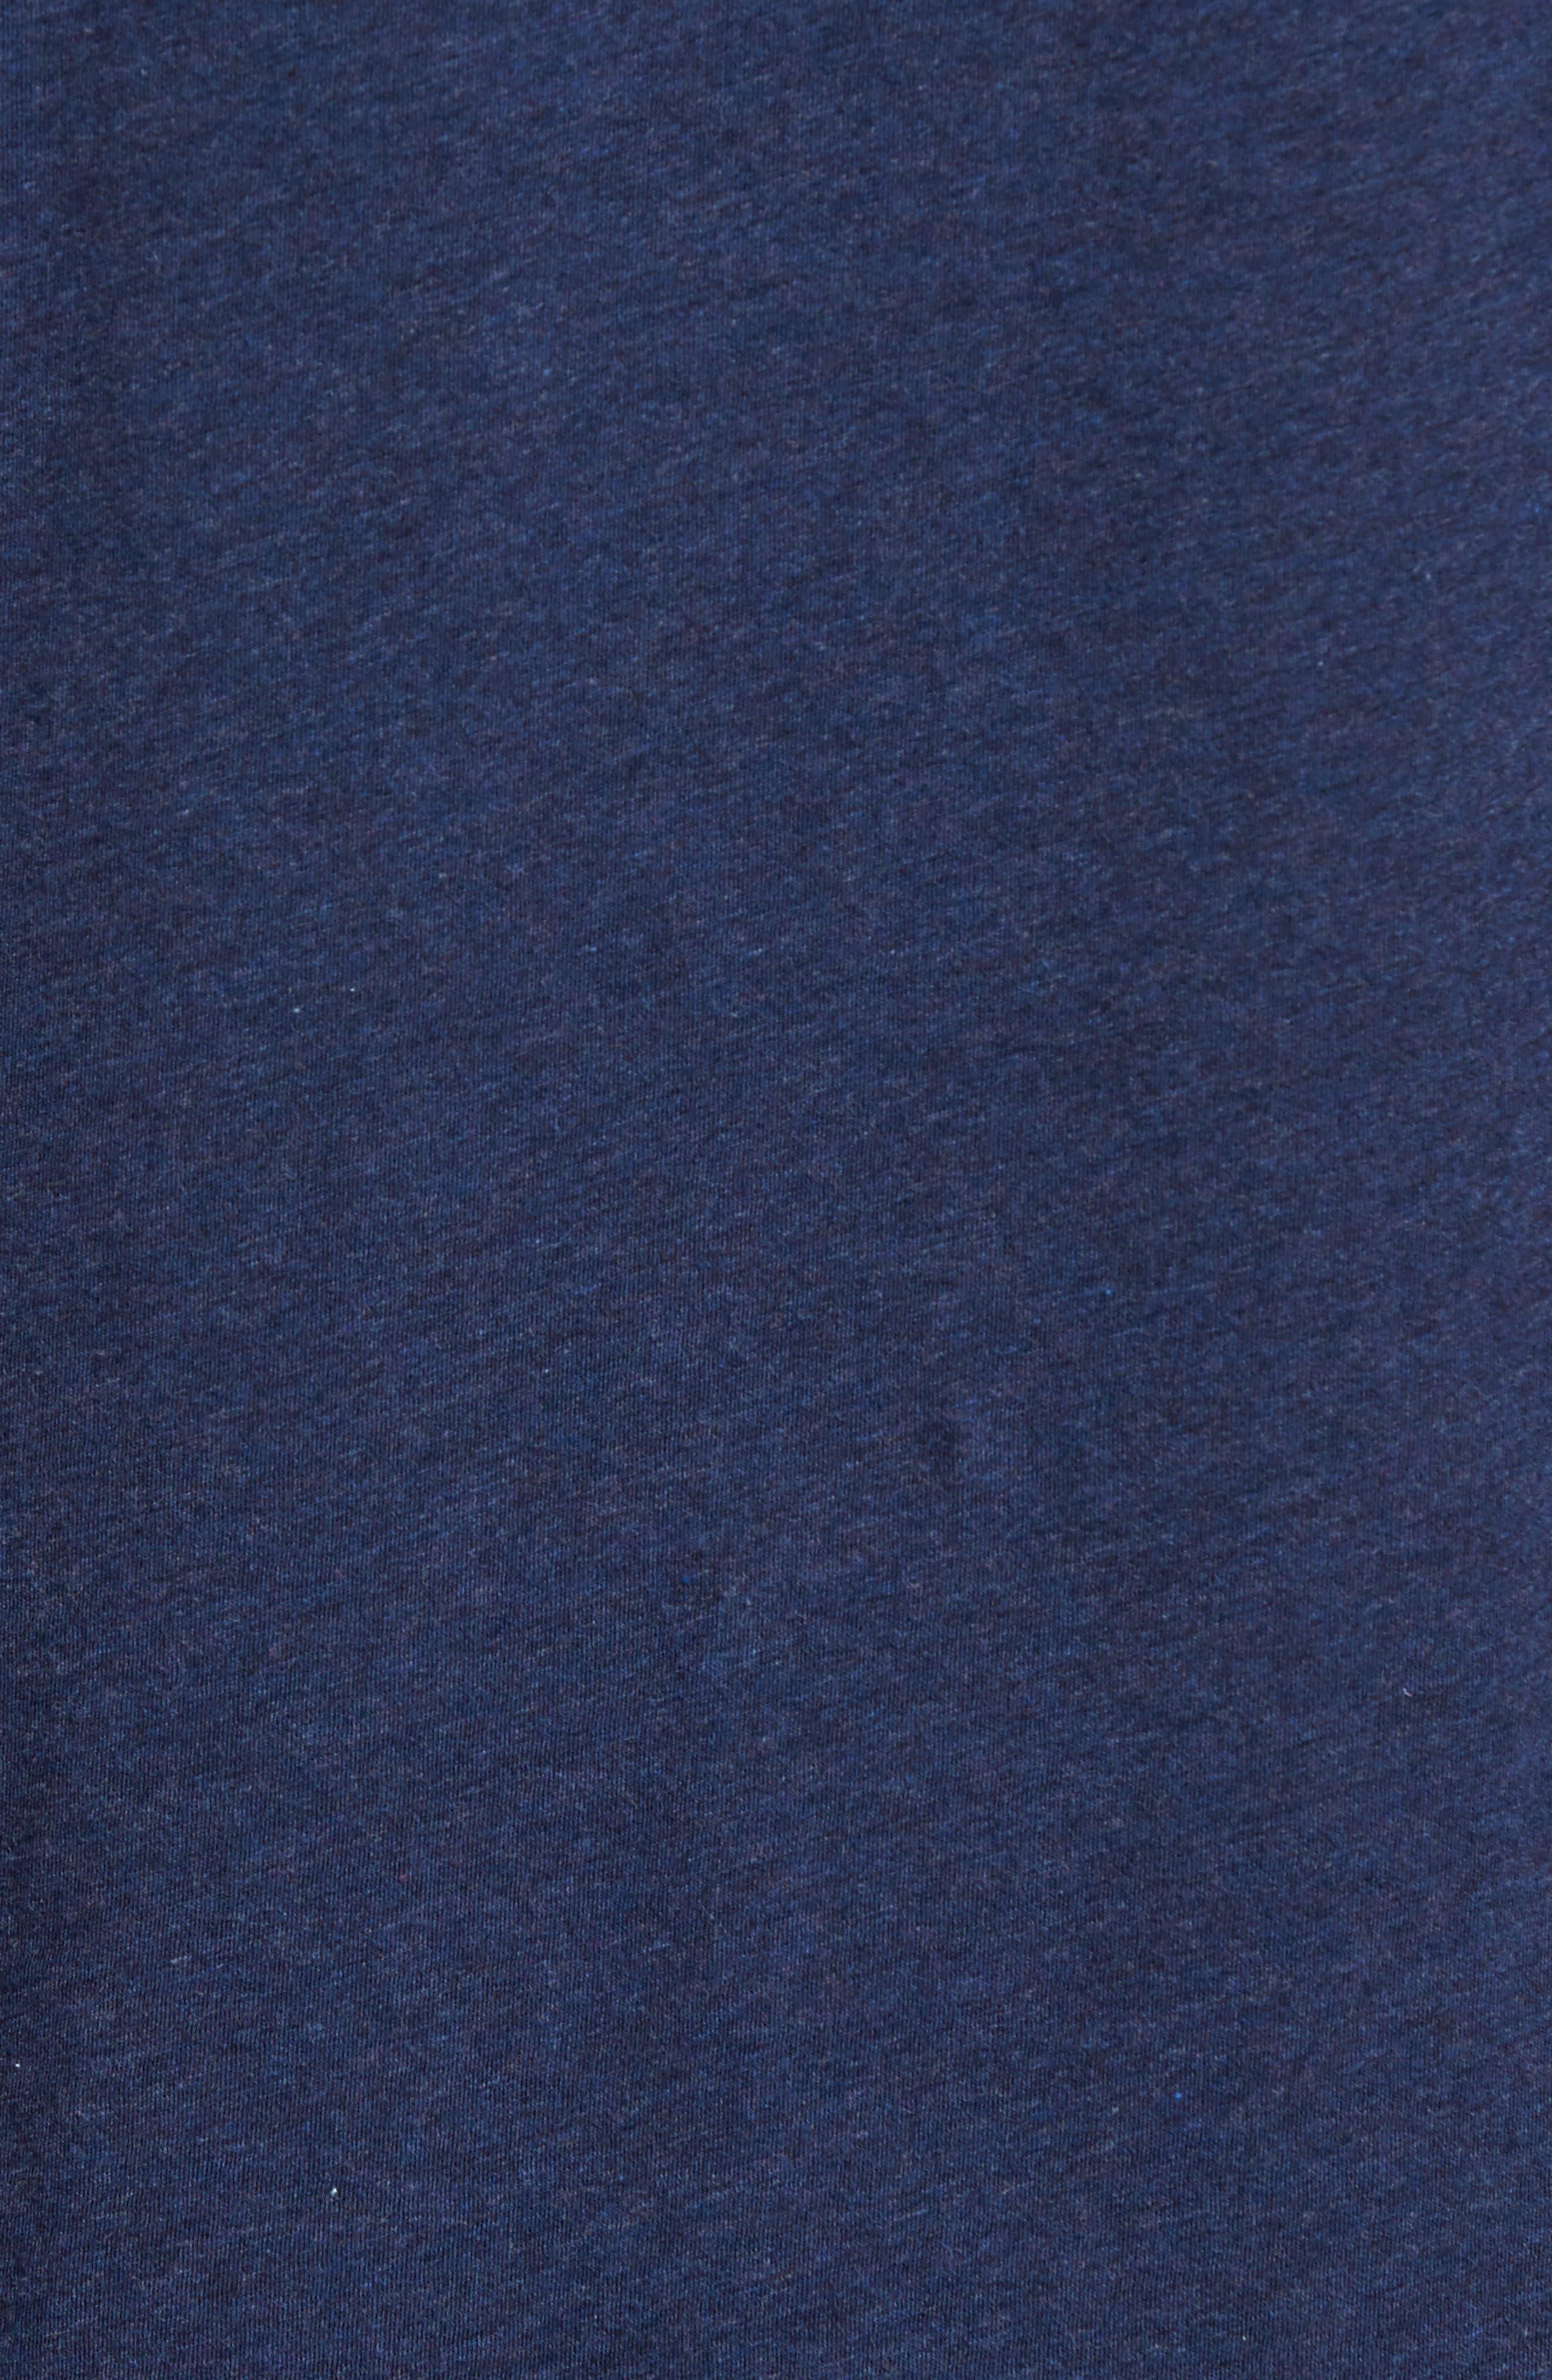 Floral Collar Jersey Polo,                             Alternate thumbnail 5, color,                             Navy